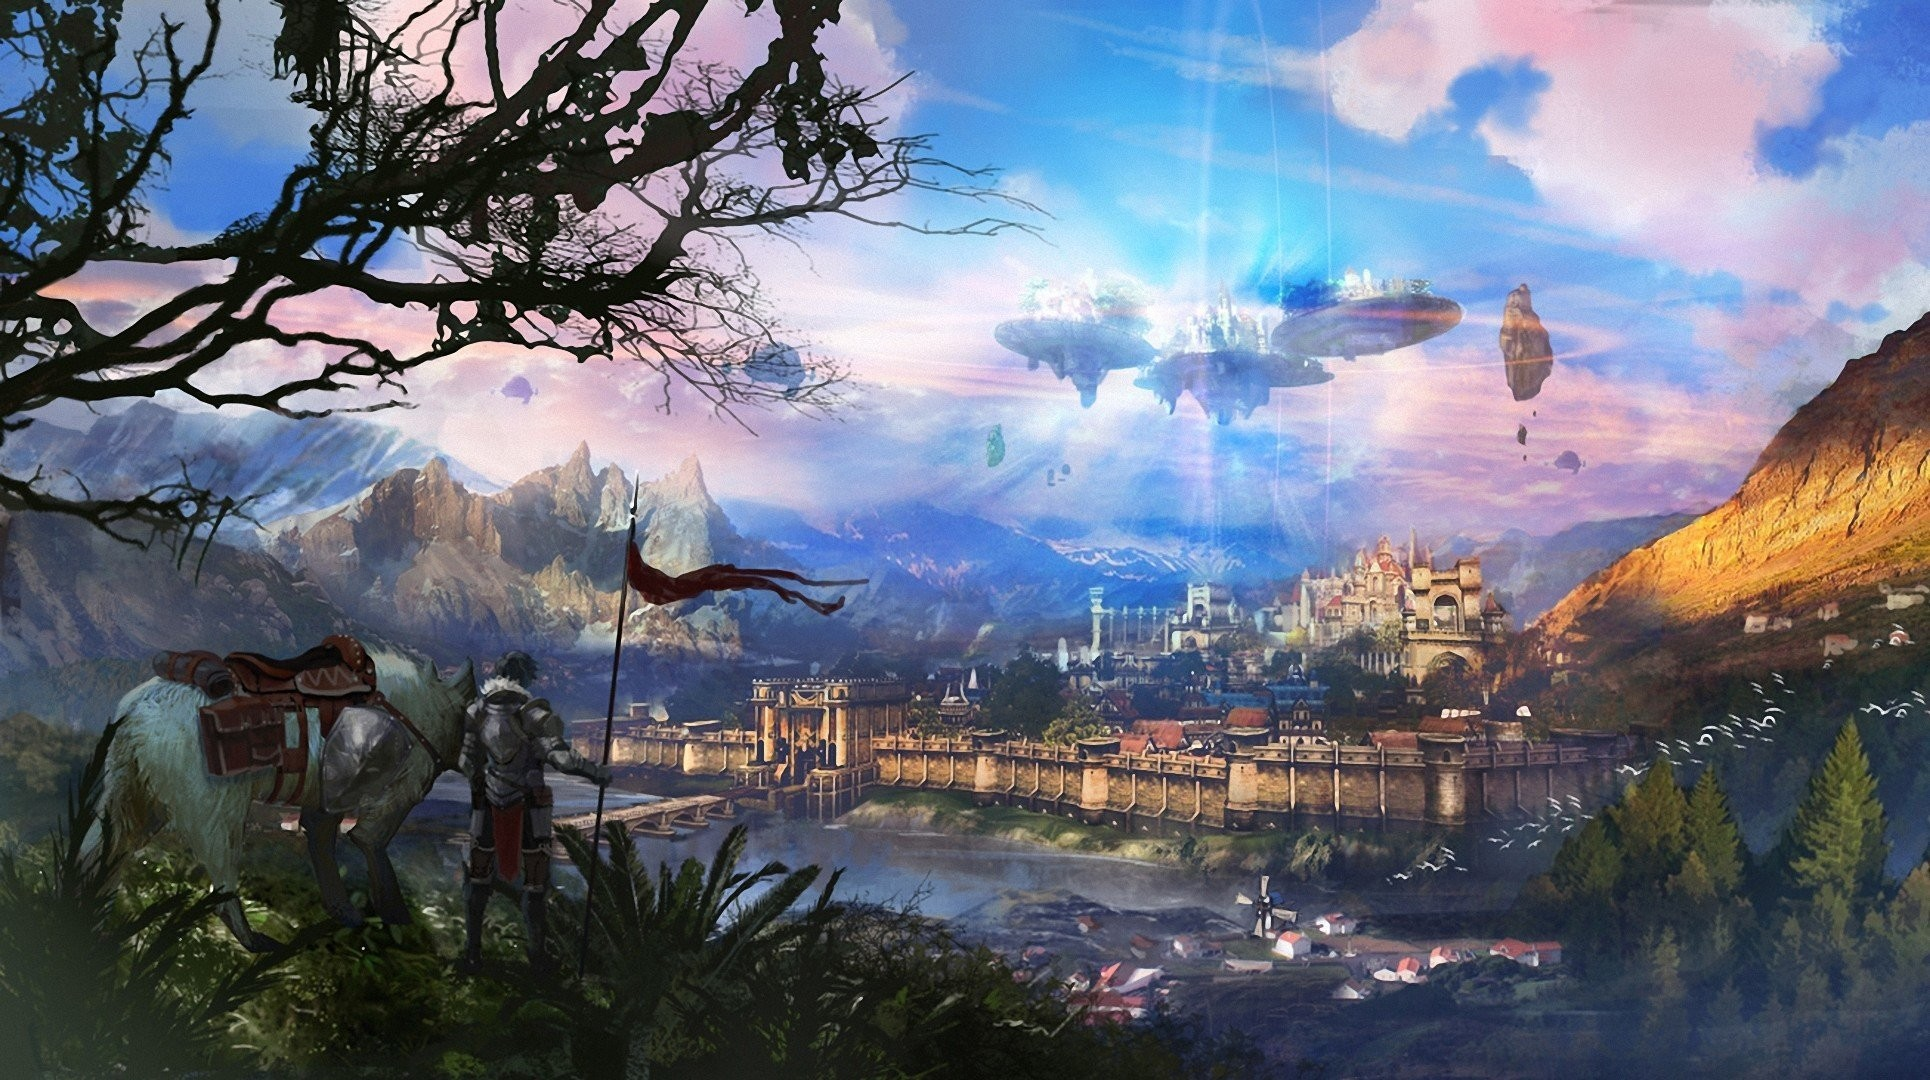 art fantasy castle flying in the sky horse horse man town tree landscape